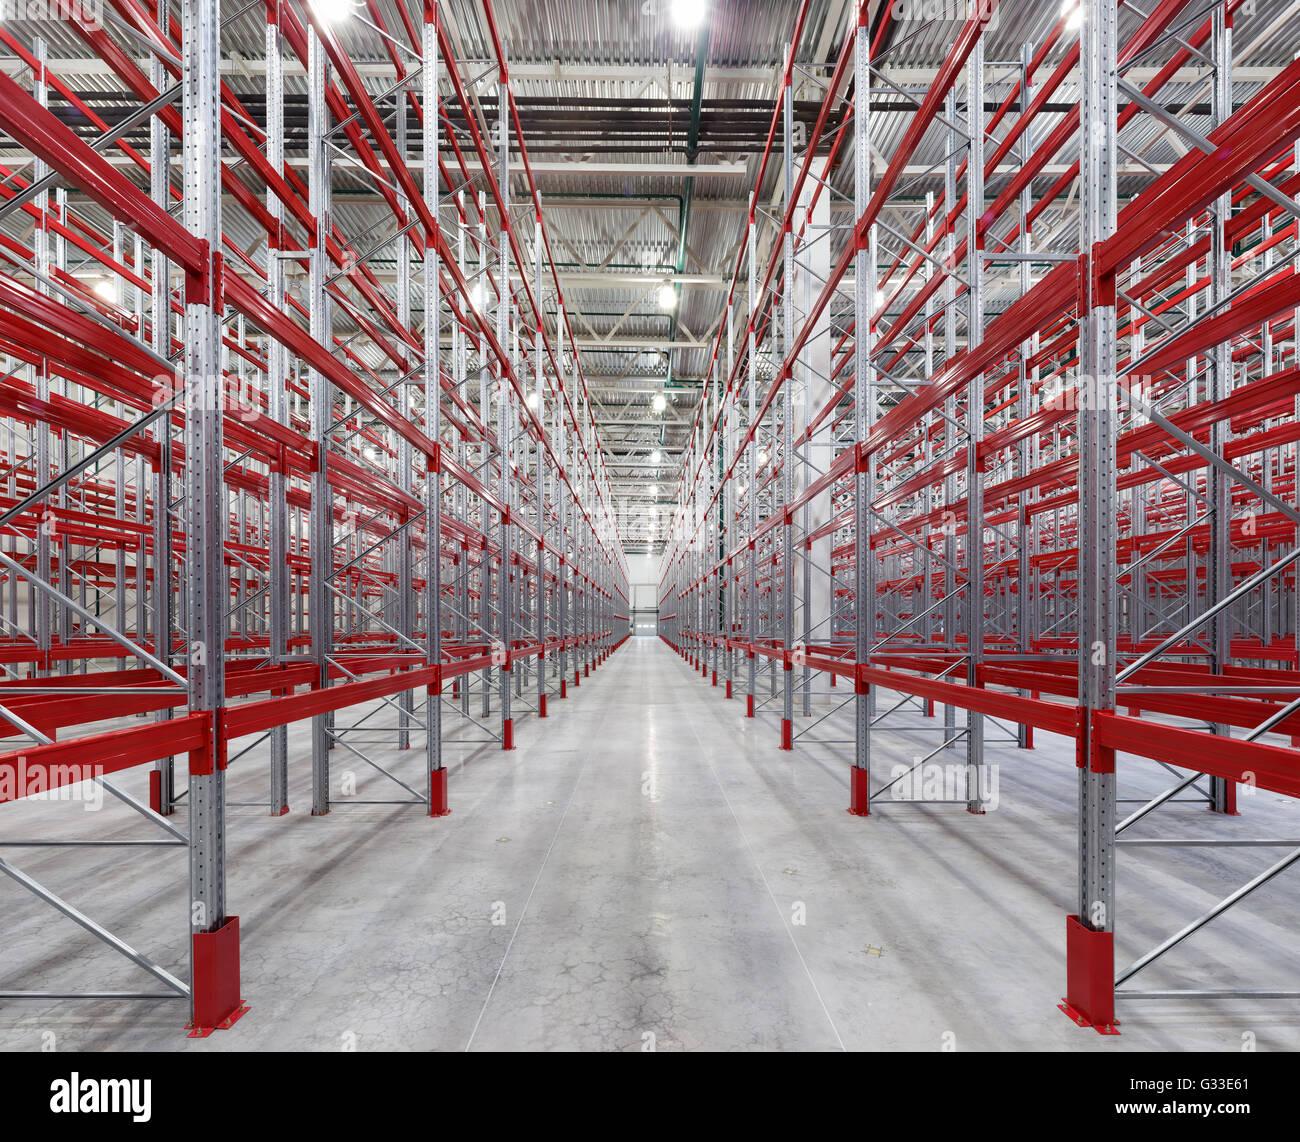 Industrial Racks Pallets Shelves In Huge Empty Warehouse